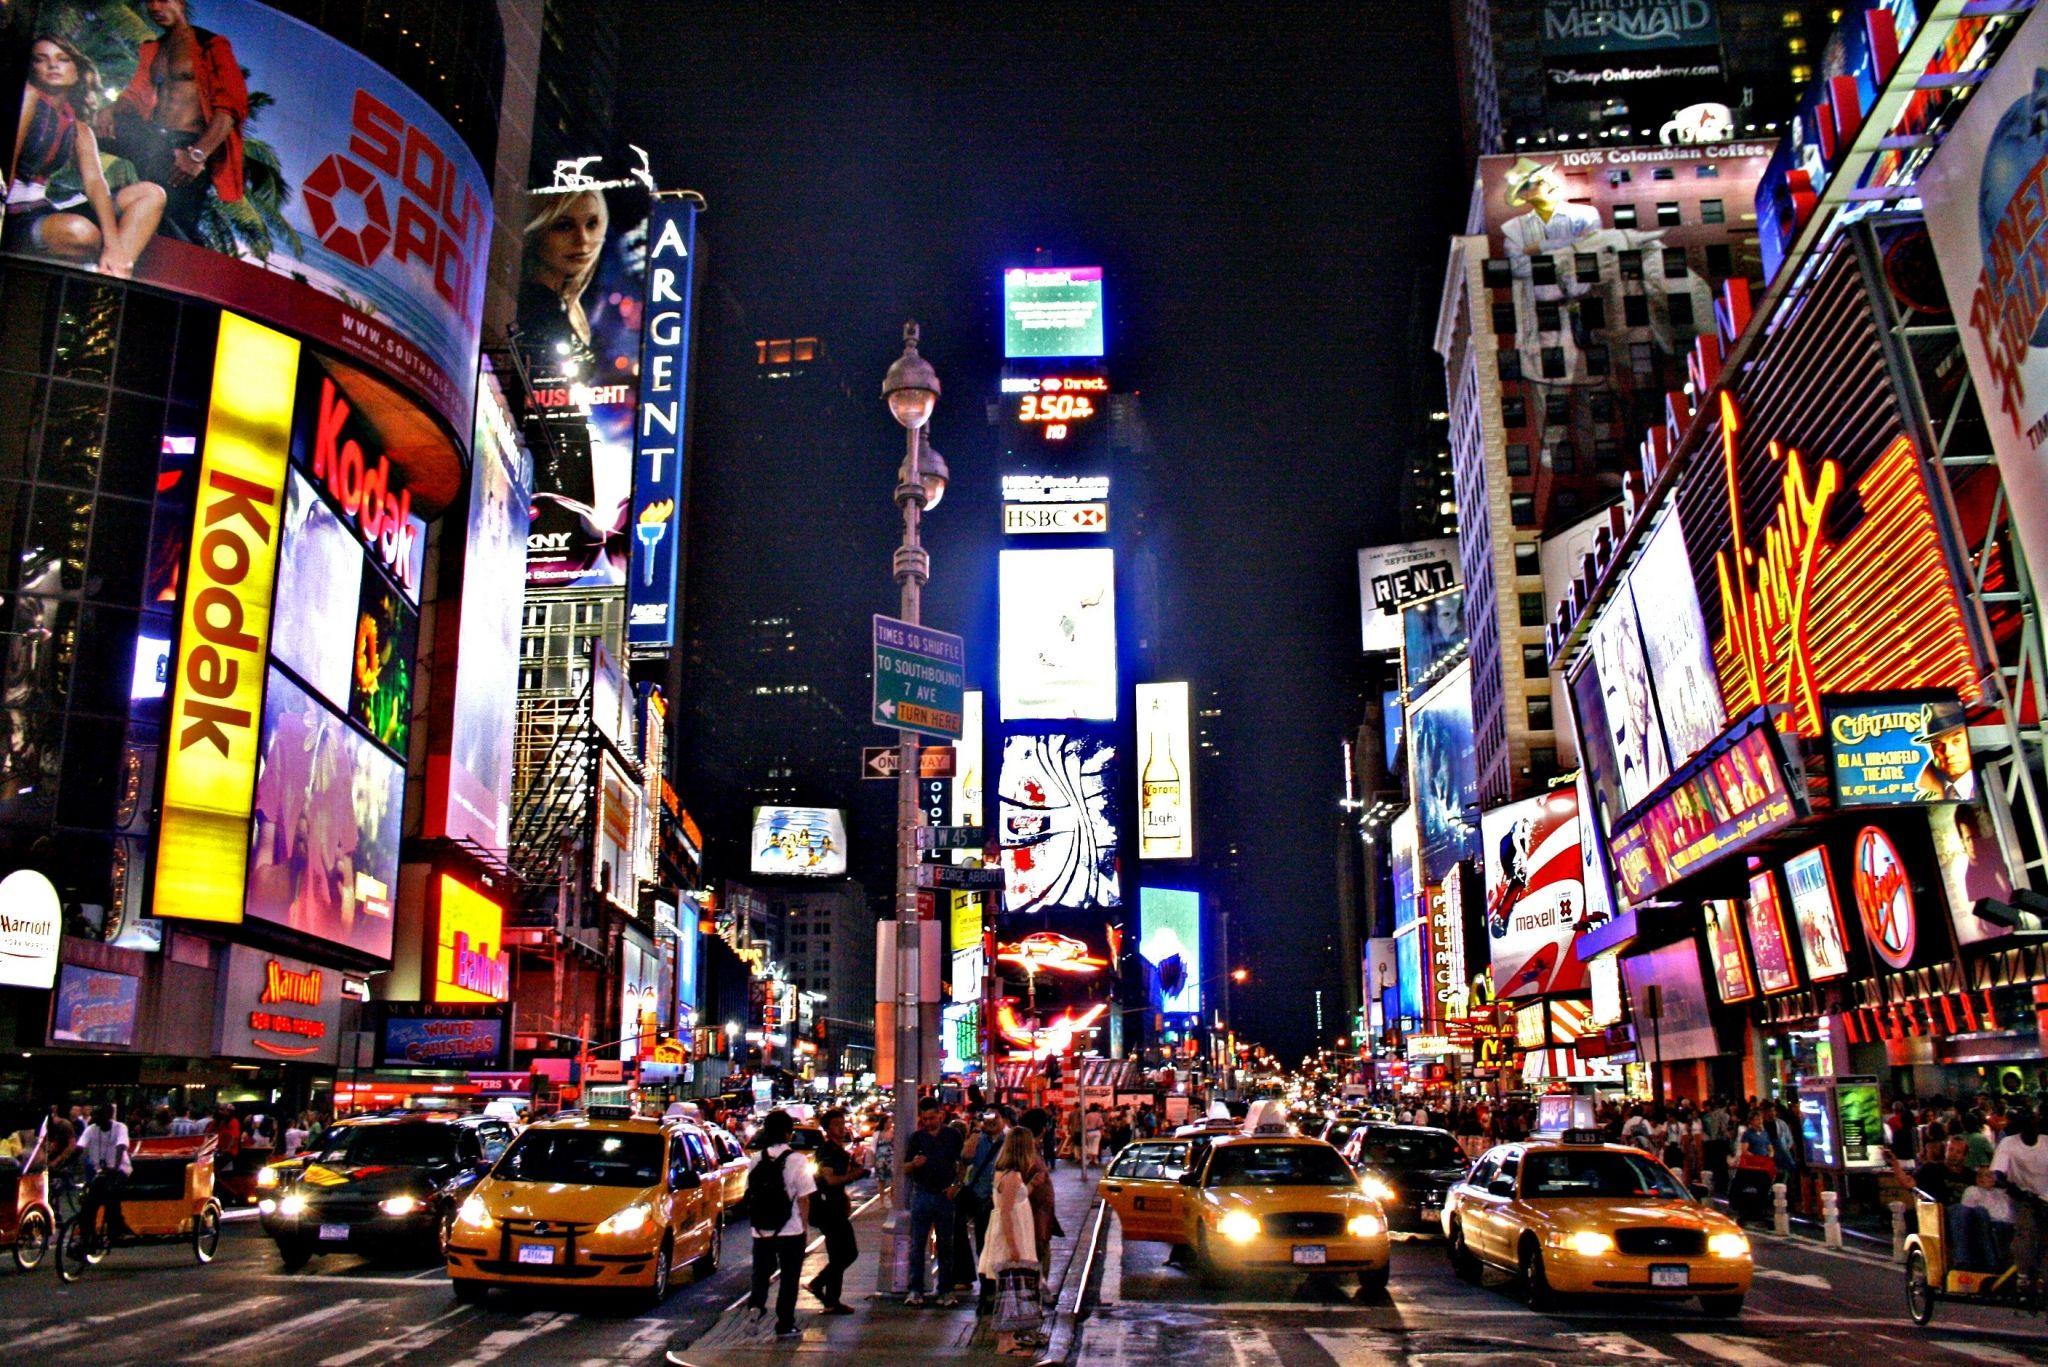 new york desktop wallpaper hd wallpapers Wallpapers